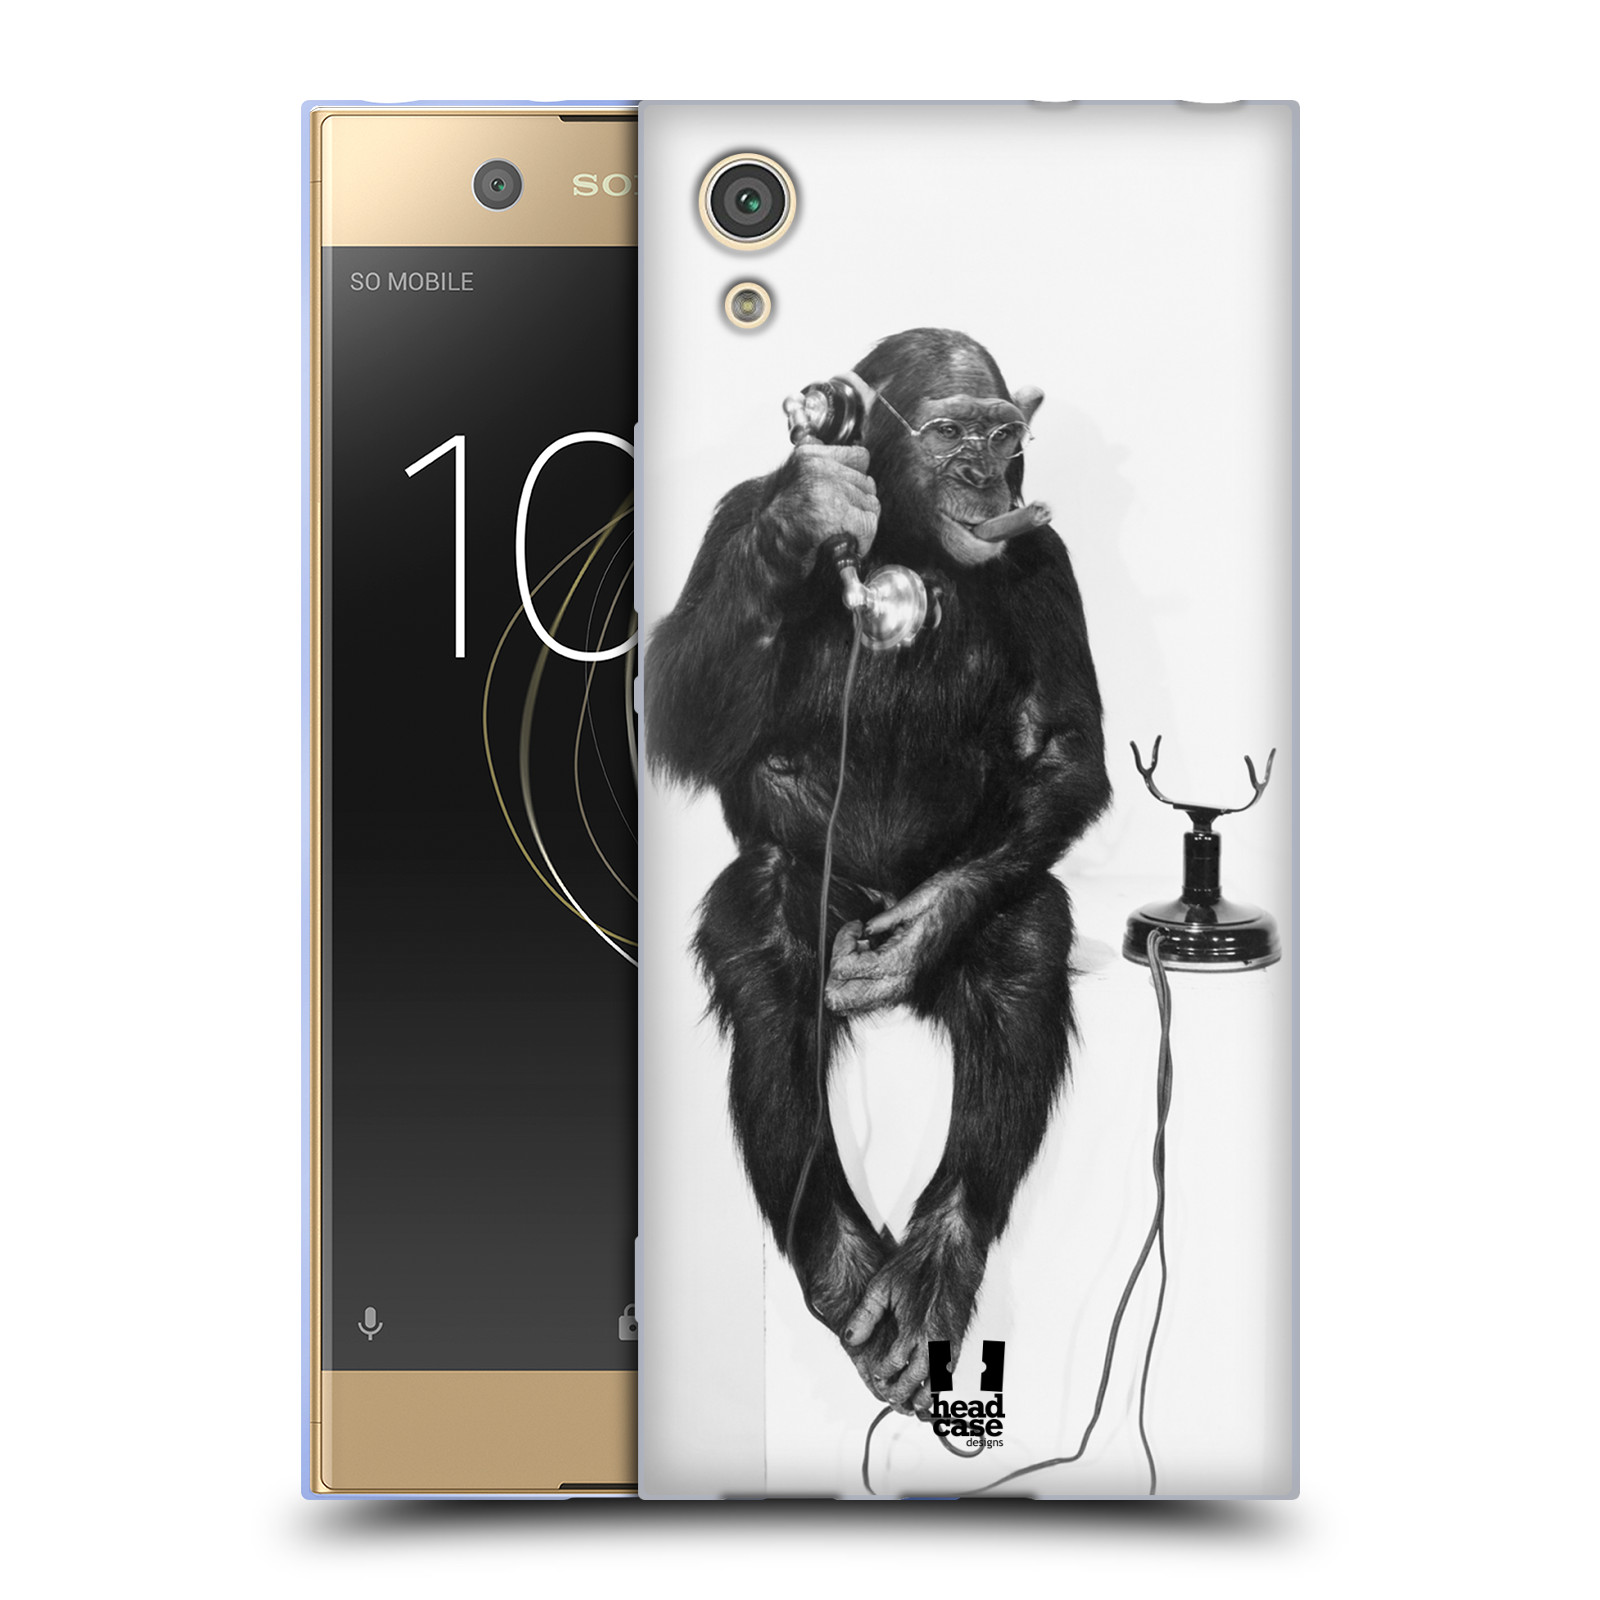 Silikonové pouzdro na mobil Sony Xperia XA1 - Head Case - OPIČÁK S TELEFONEM (Silikonový kryt či obal na mobilní telefon Sony Xperia XA1 G3121 s motivem OPIČÁK S TELEFONEM)